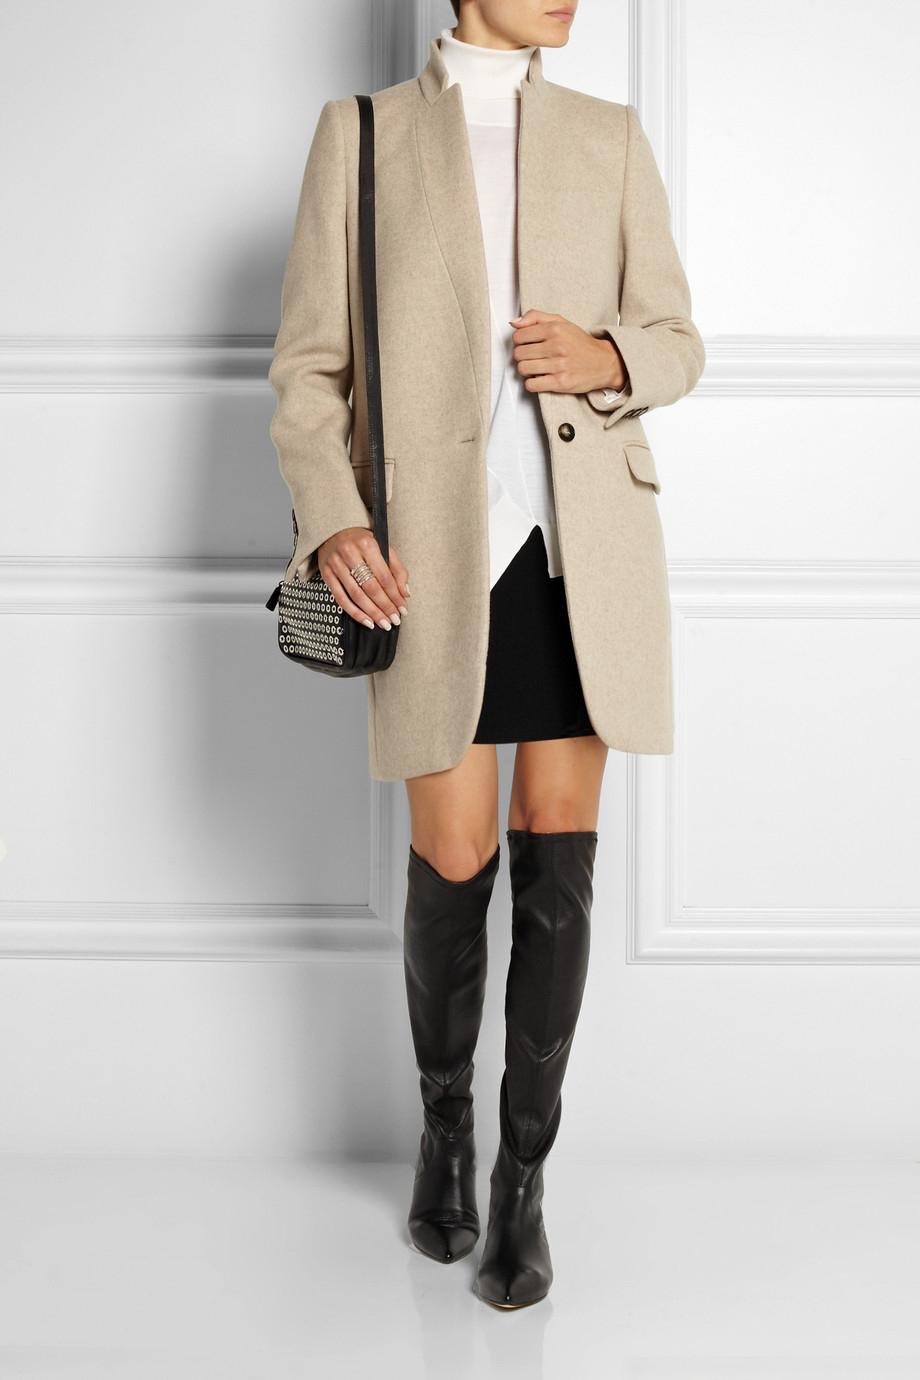 sale exclusive discount big discount Sigerson Morrison Suede Knee-High Boots marketable sale online 7haSGfW